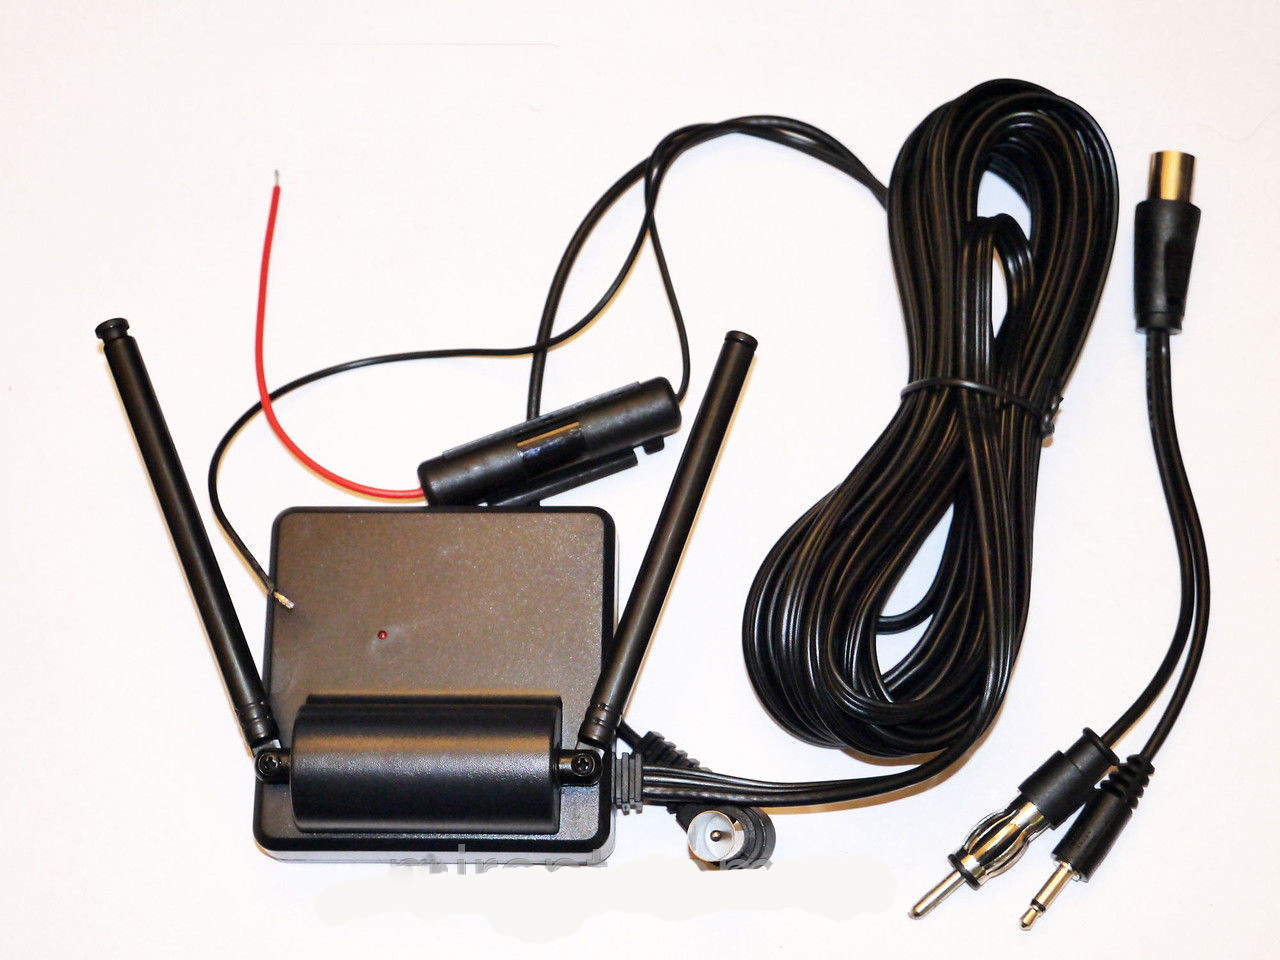 Универсальная автомобильная антенна TV/FM/UHF/VHF